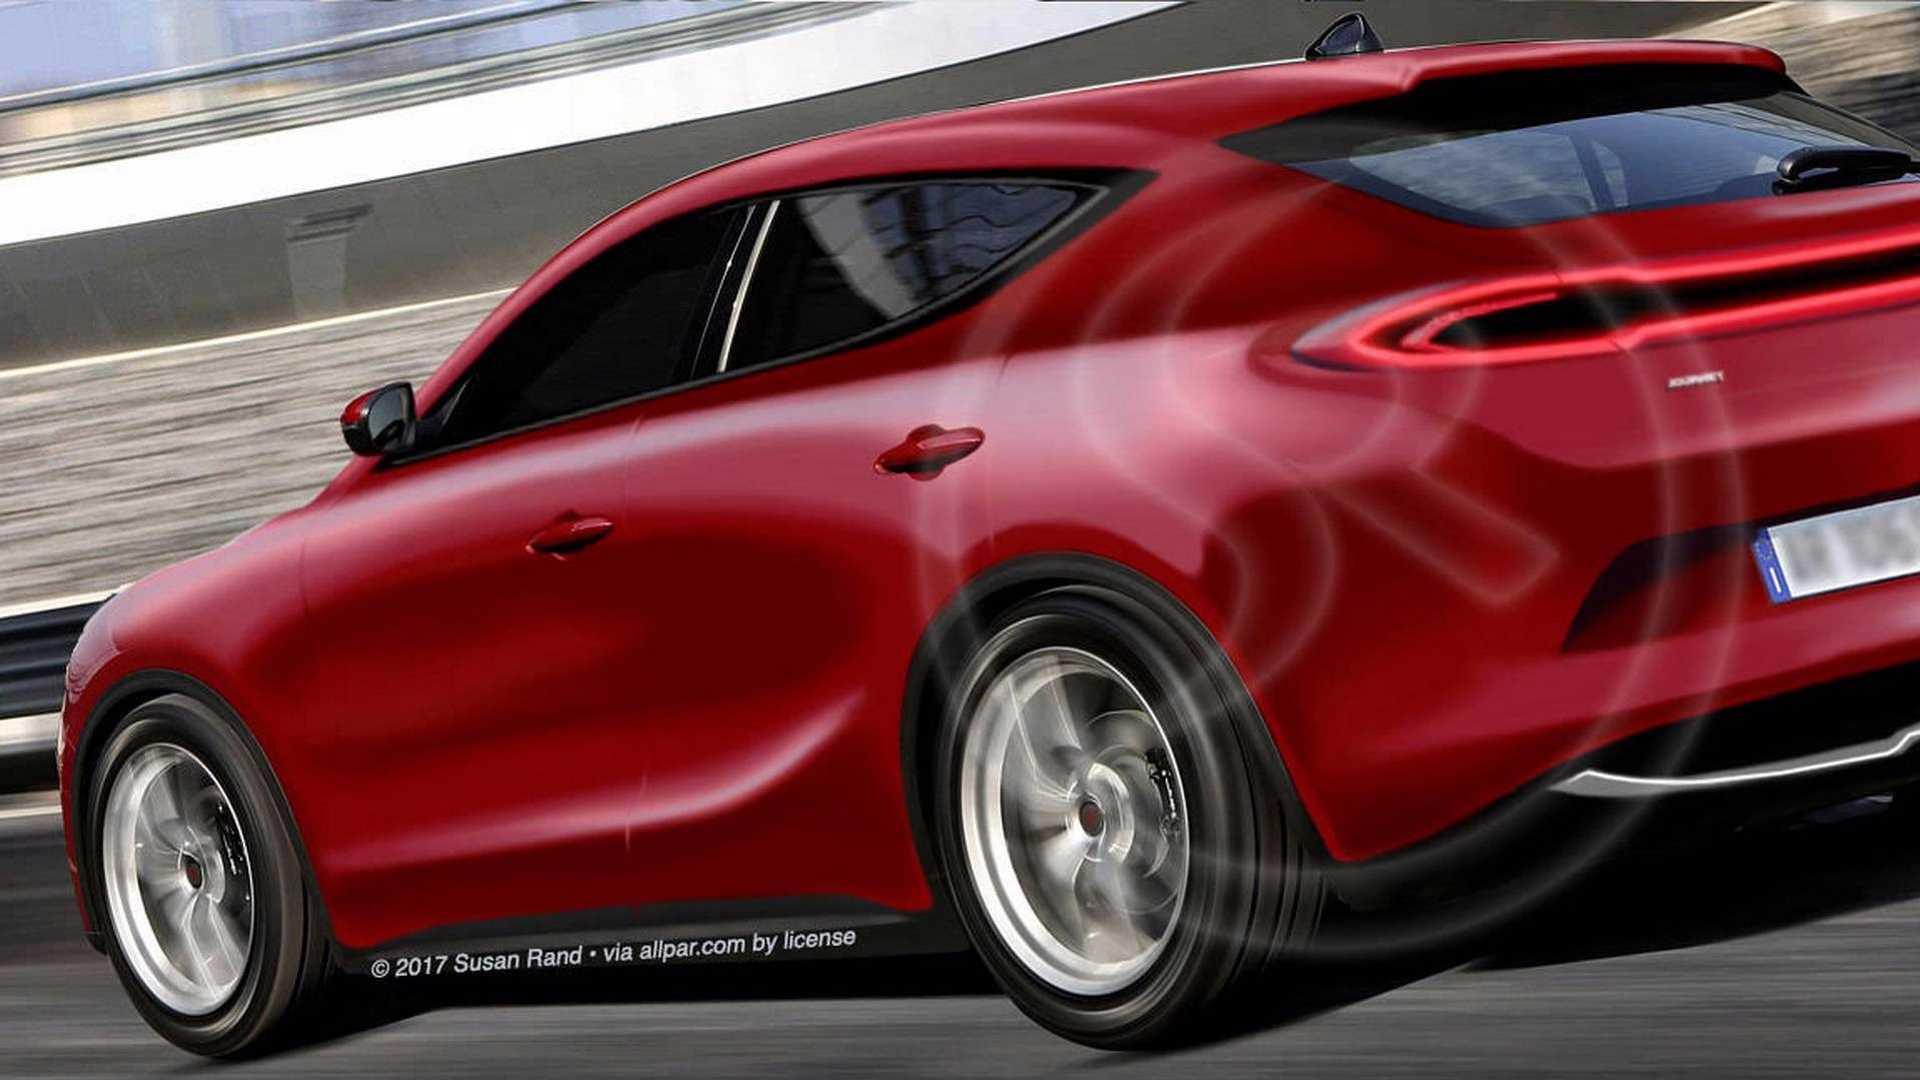 85 Best Review 2020 Dodge Journey Concept for 2020 Dodge Journey